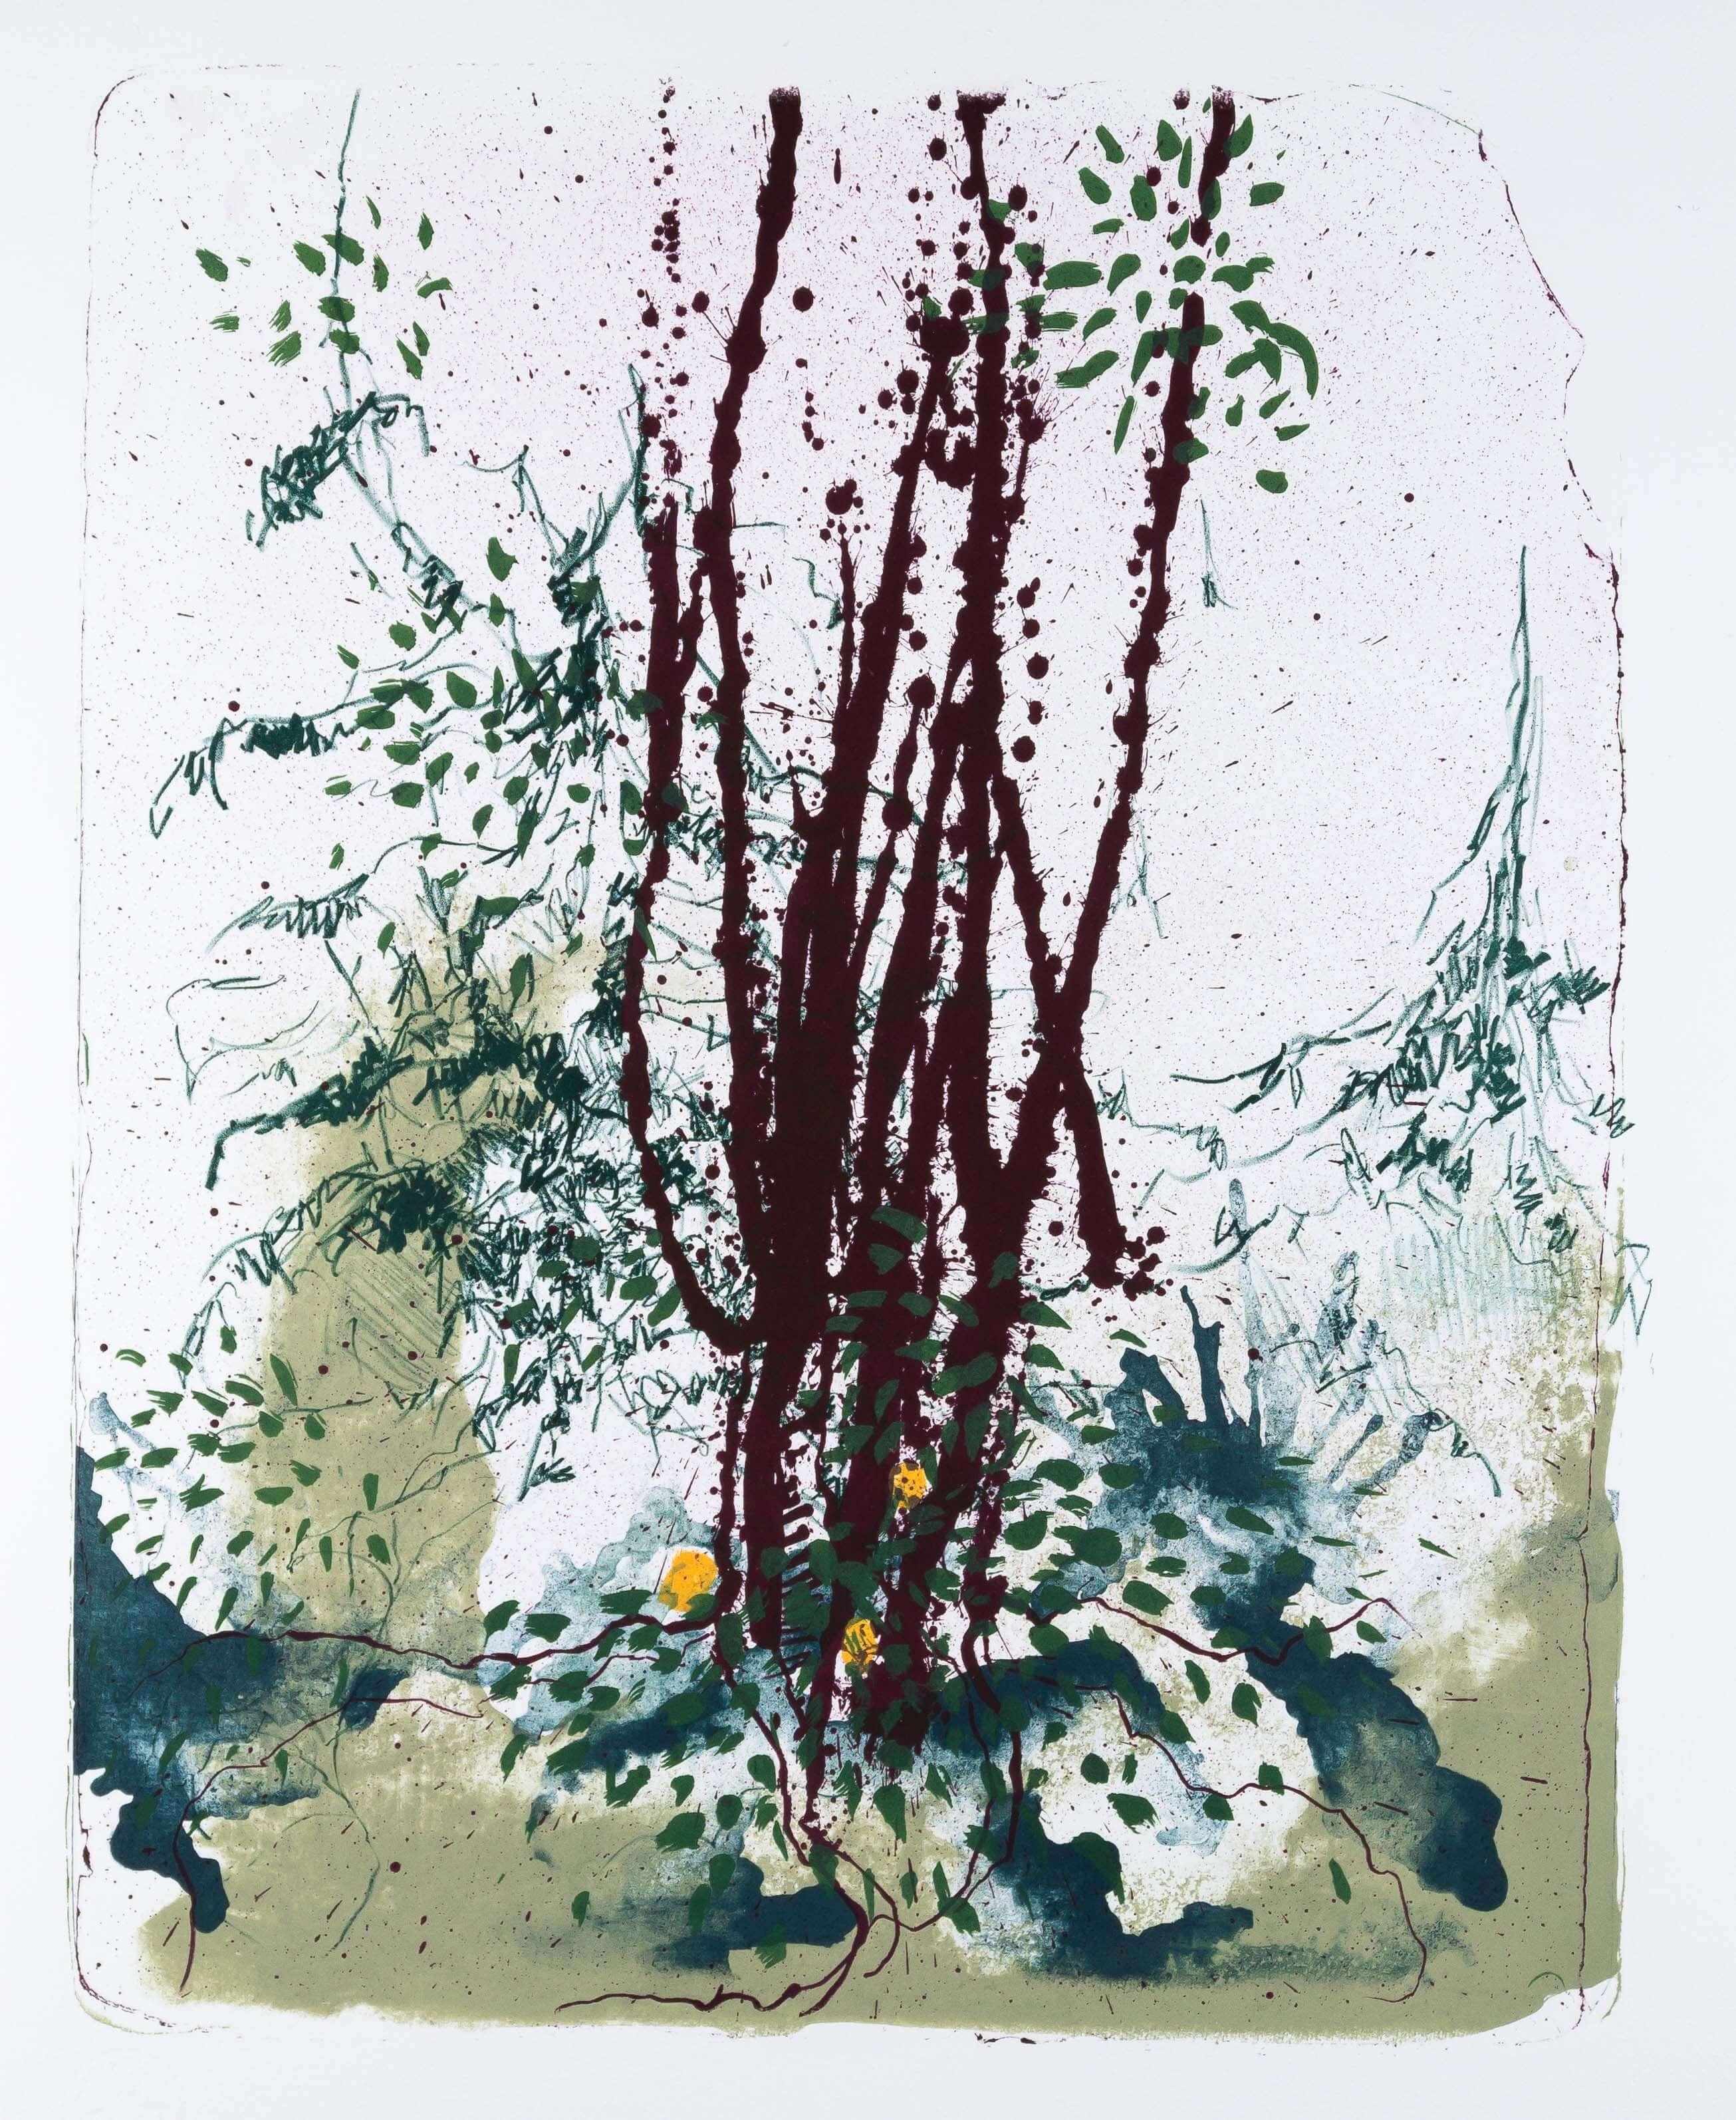 Katharina Albers: Wald X(F)-XI, 2017, Farb-Lithographie, Unikat, 50x40 cm